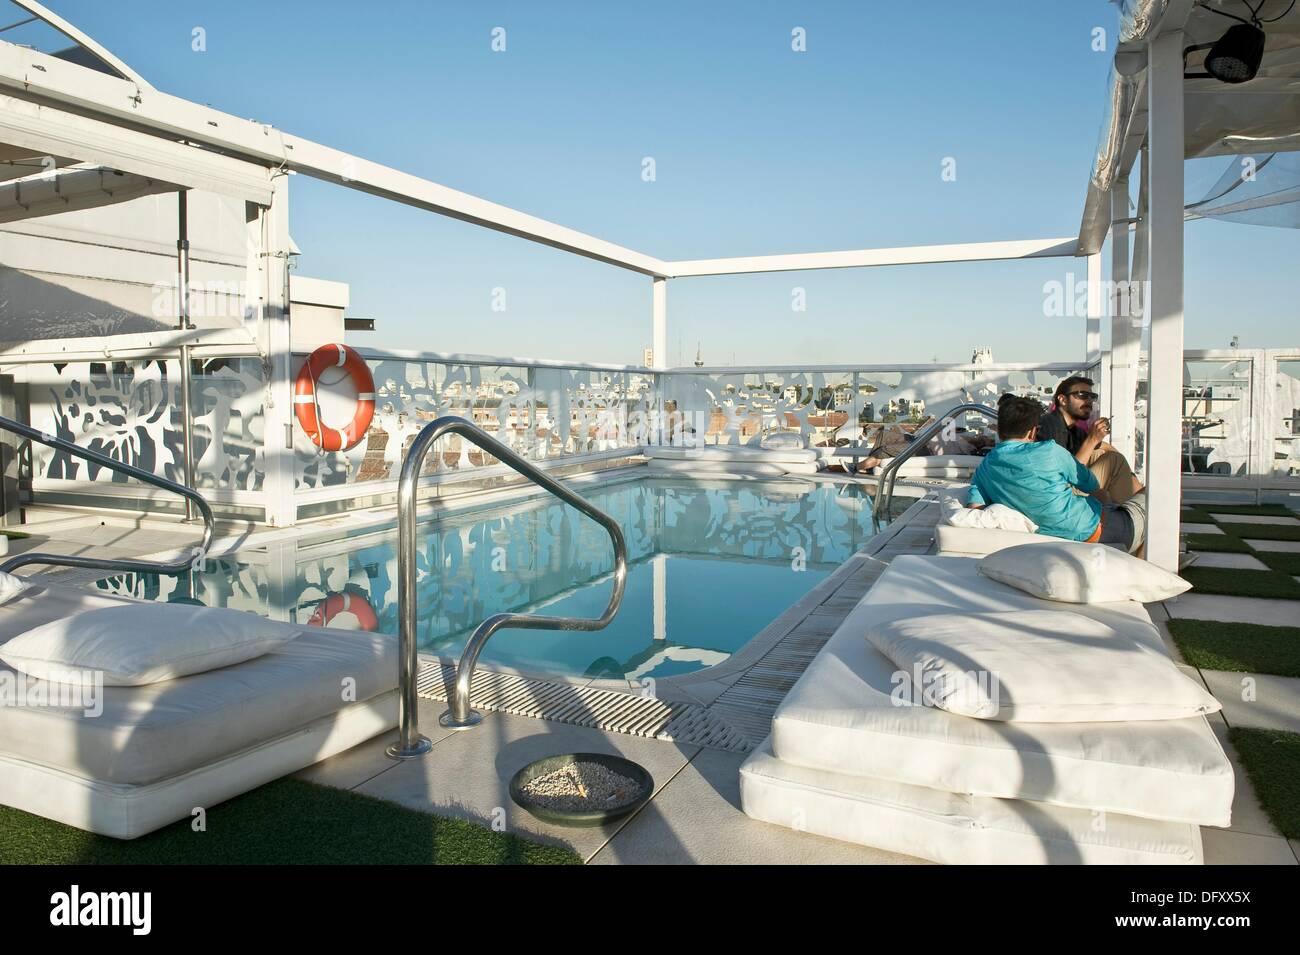 Oscar Hotel Terrace In Madrid Spain Stock Photo 61442246